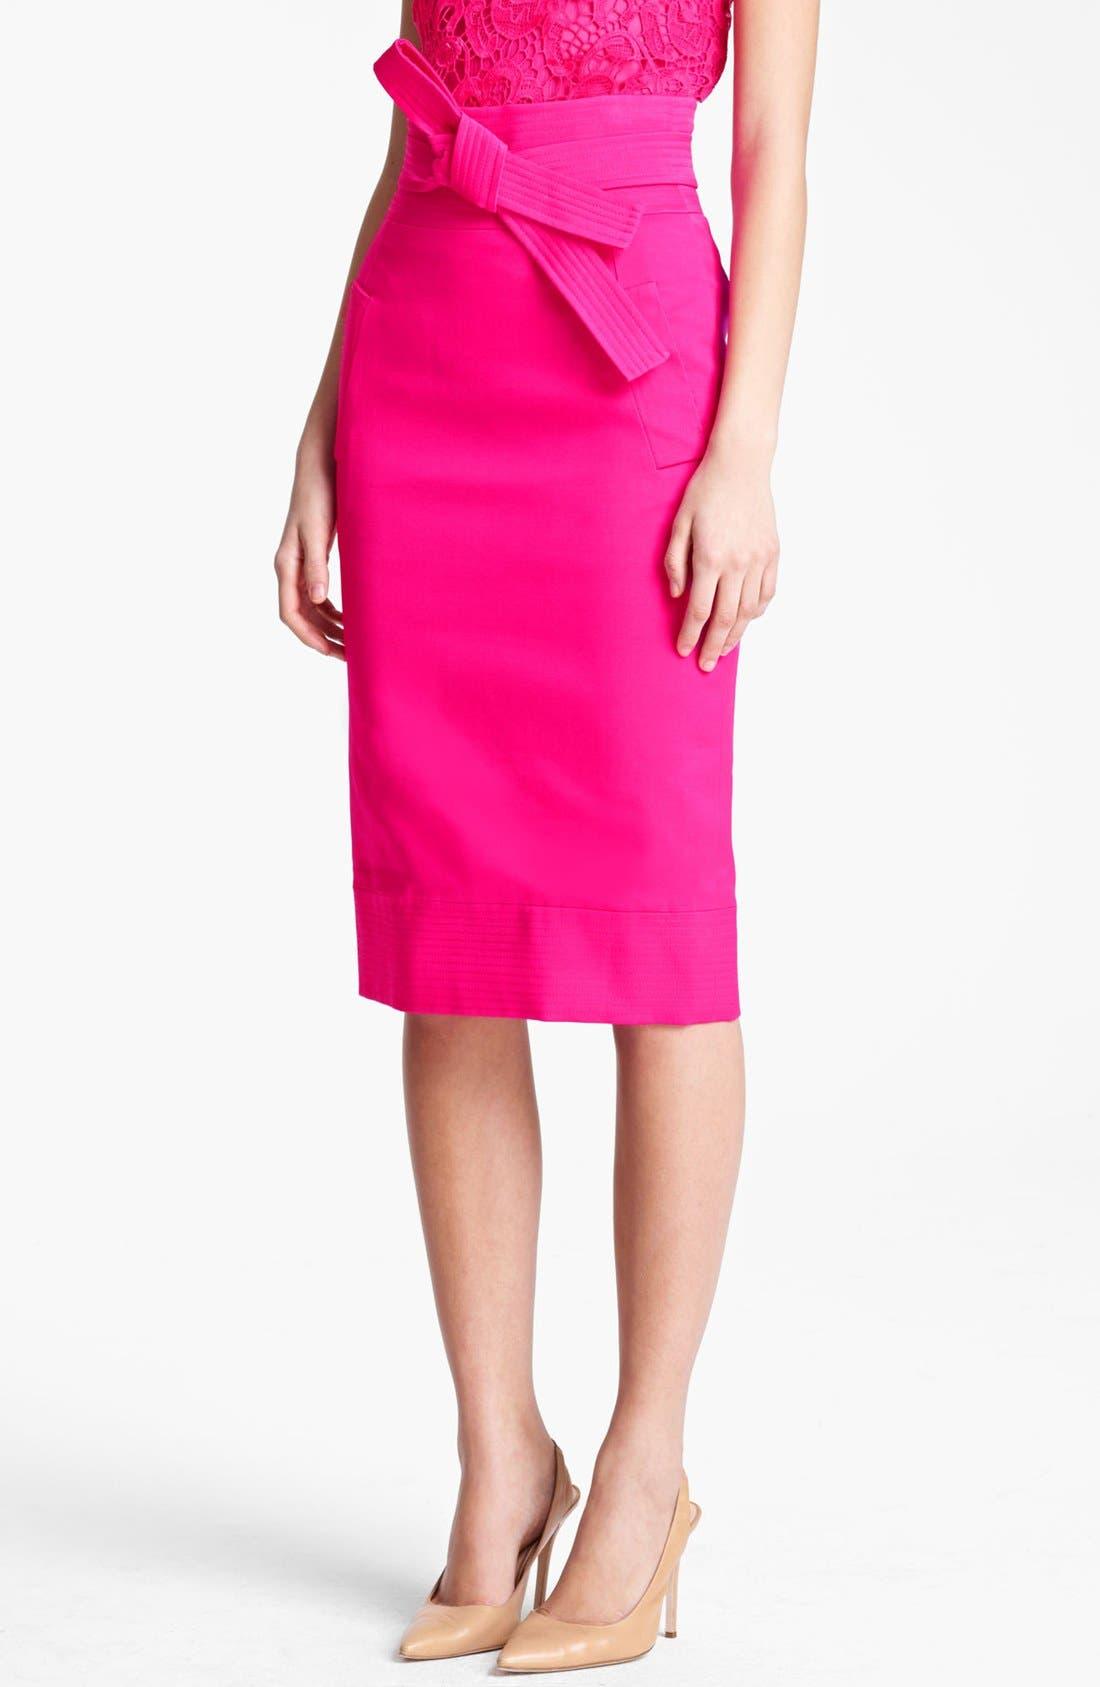 Main Image - Oscar de la Renta High Waist Tie Front Skirt